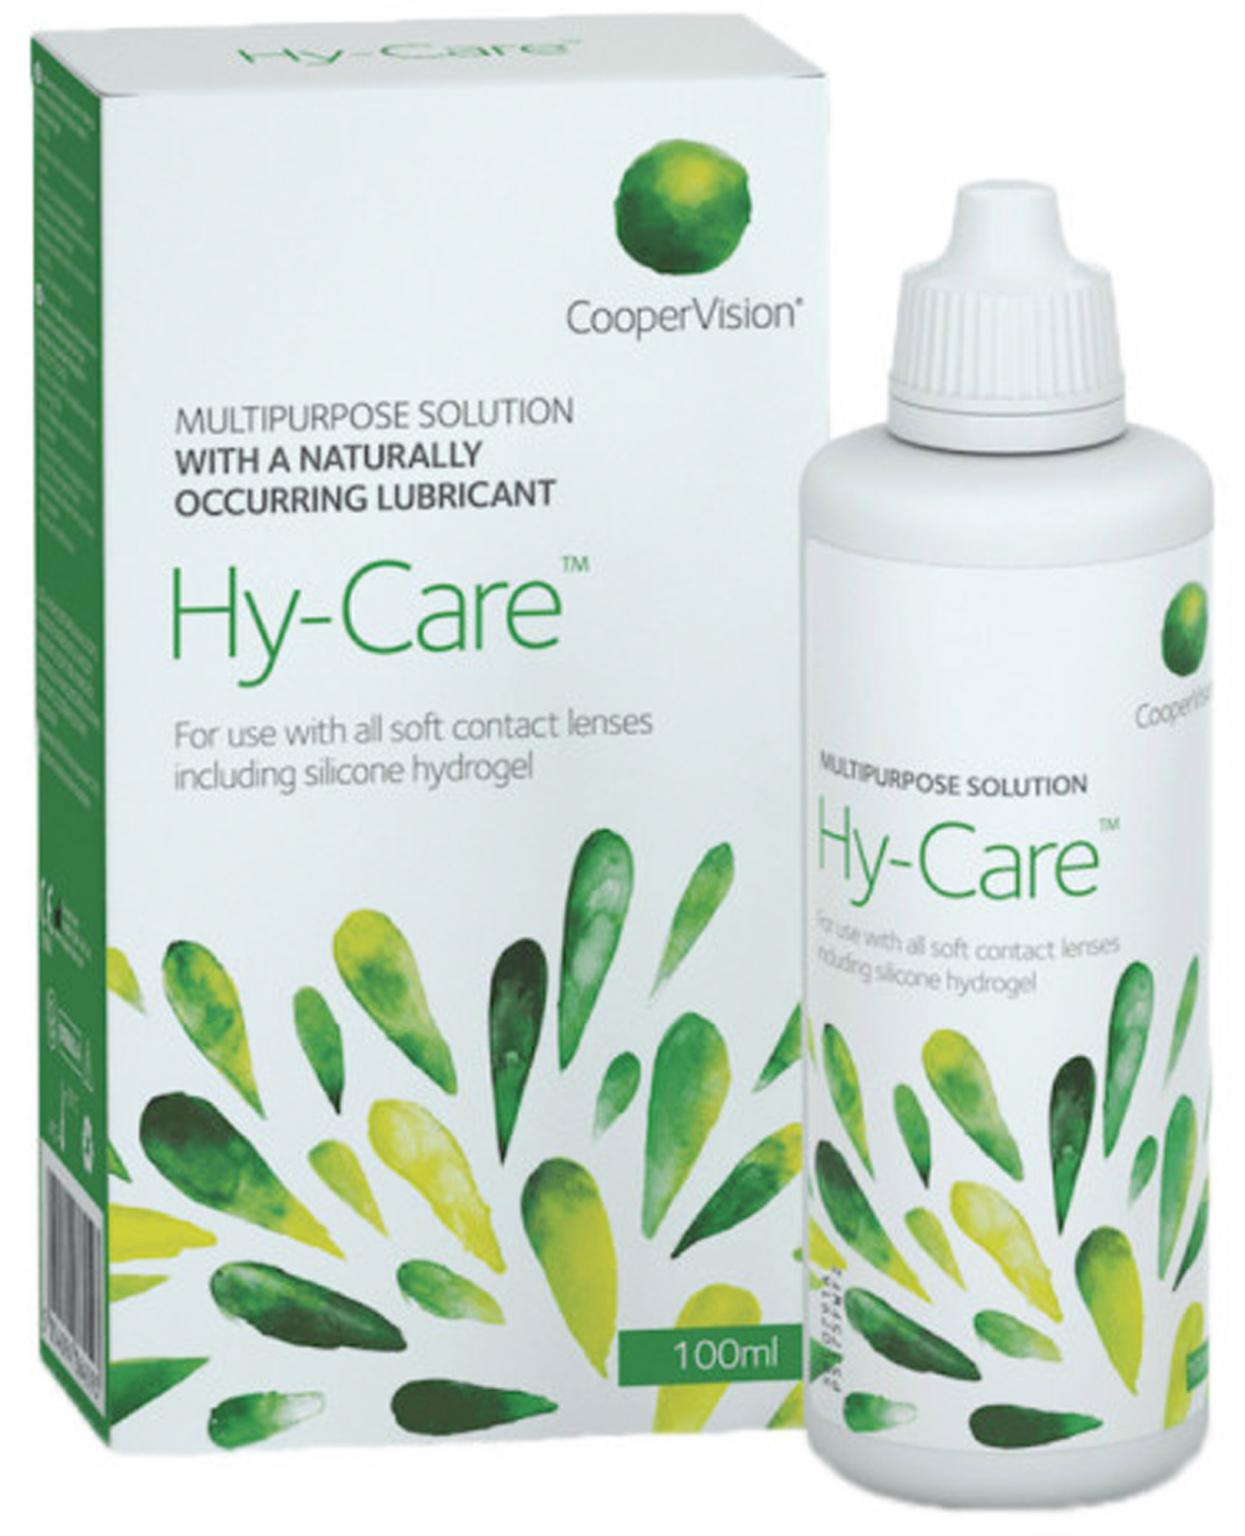 Раствор Hy-Care 100 мл + контейнер